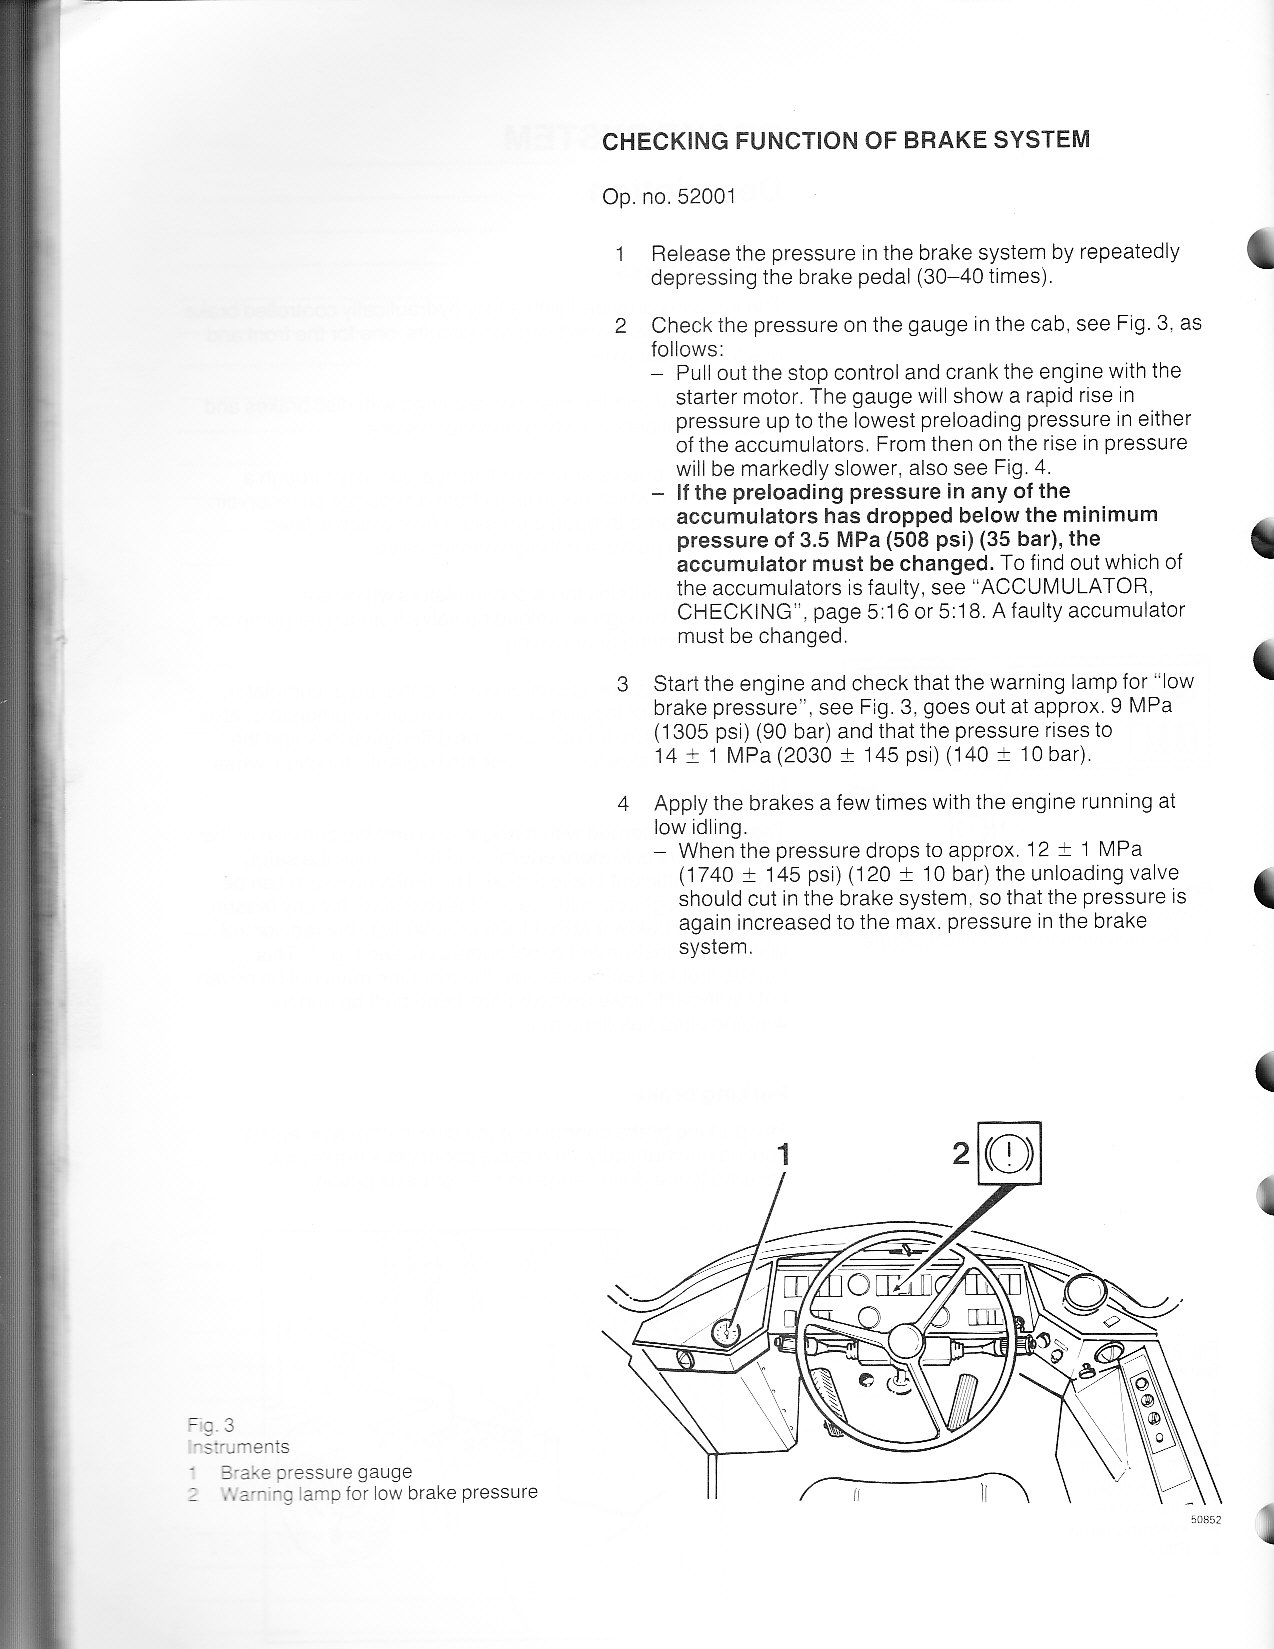 I have a 1991 Michigan (Volvo) wheel loader  When you crank the